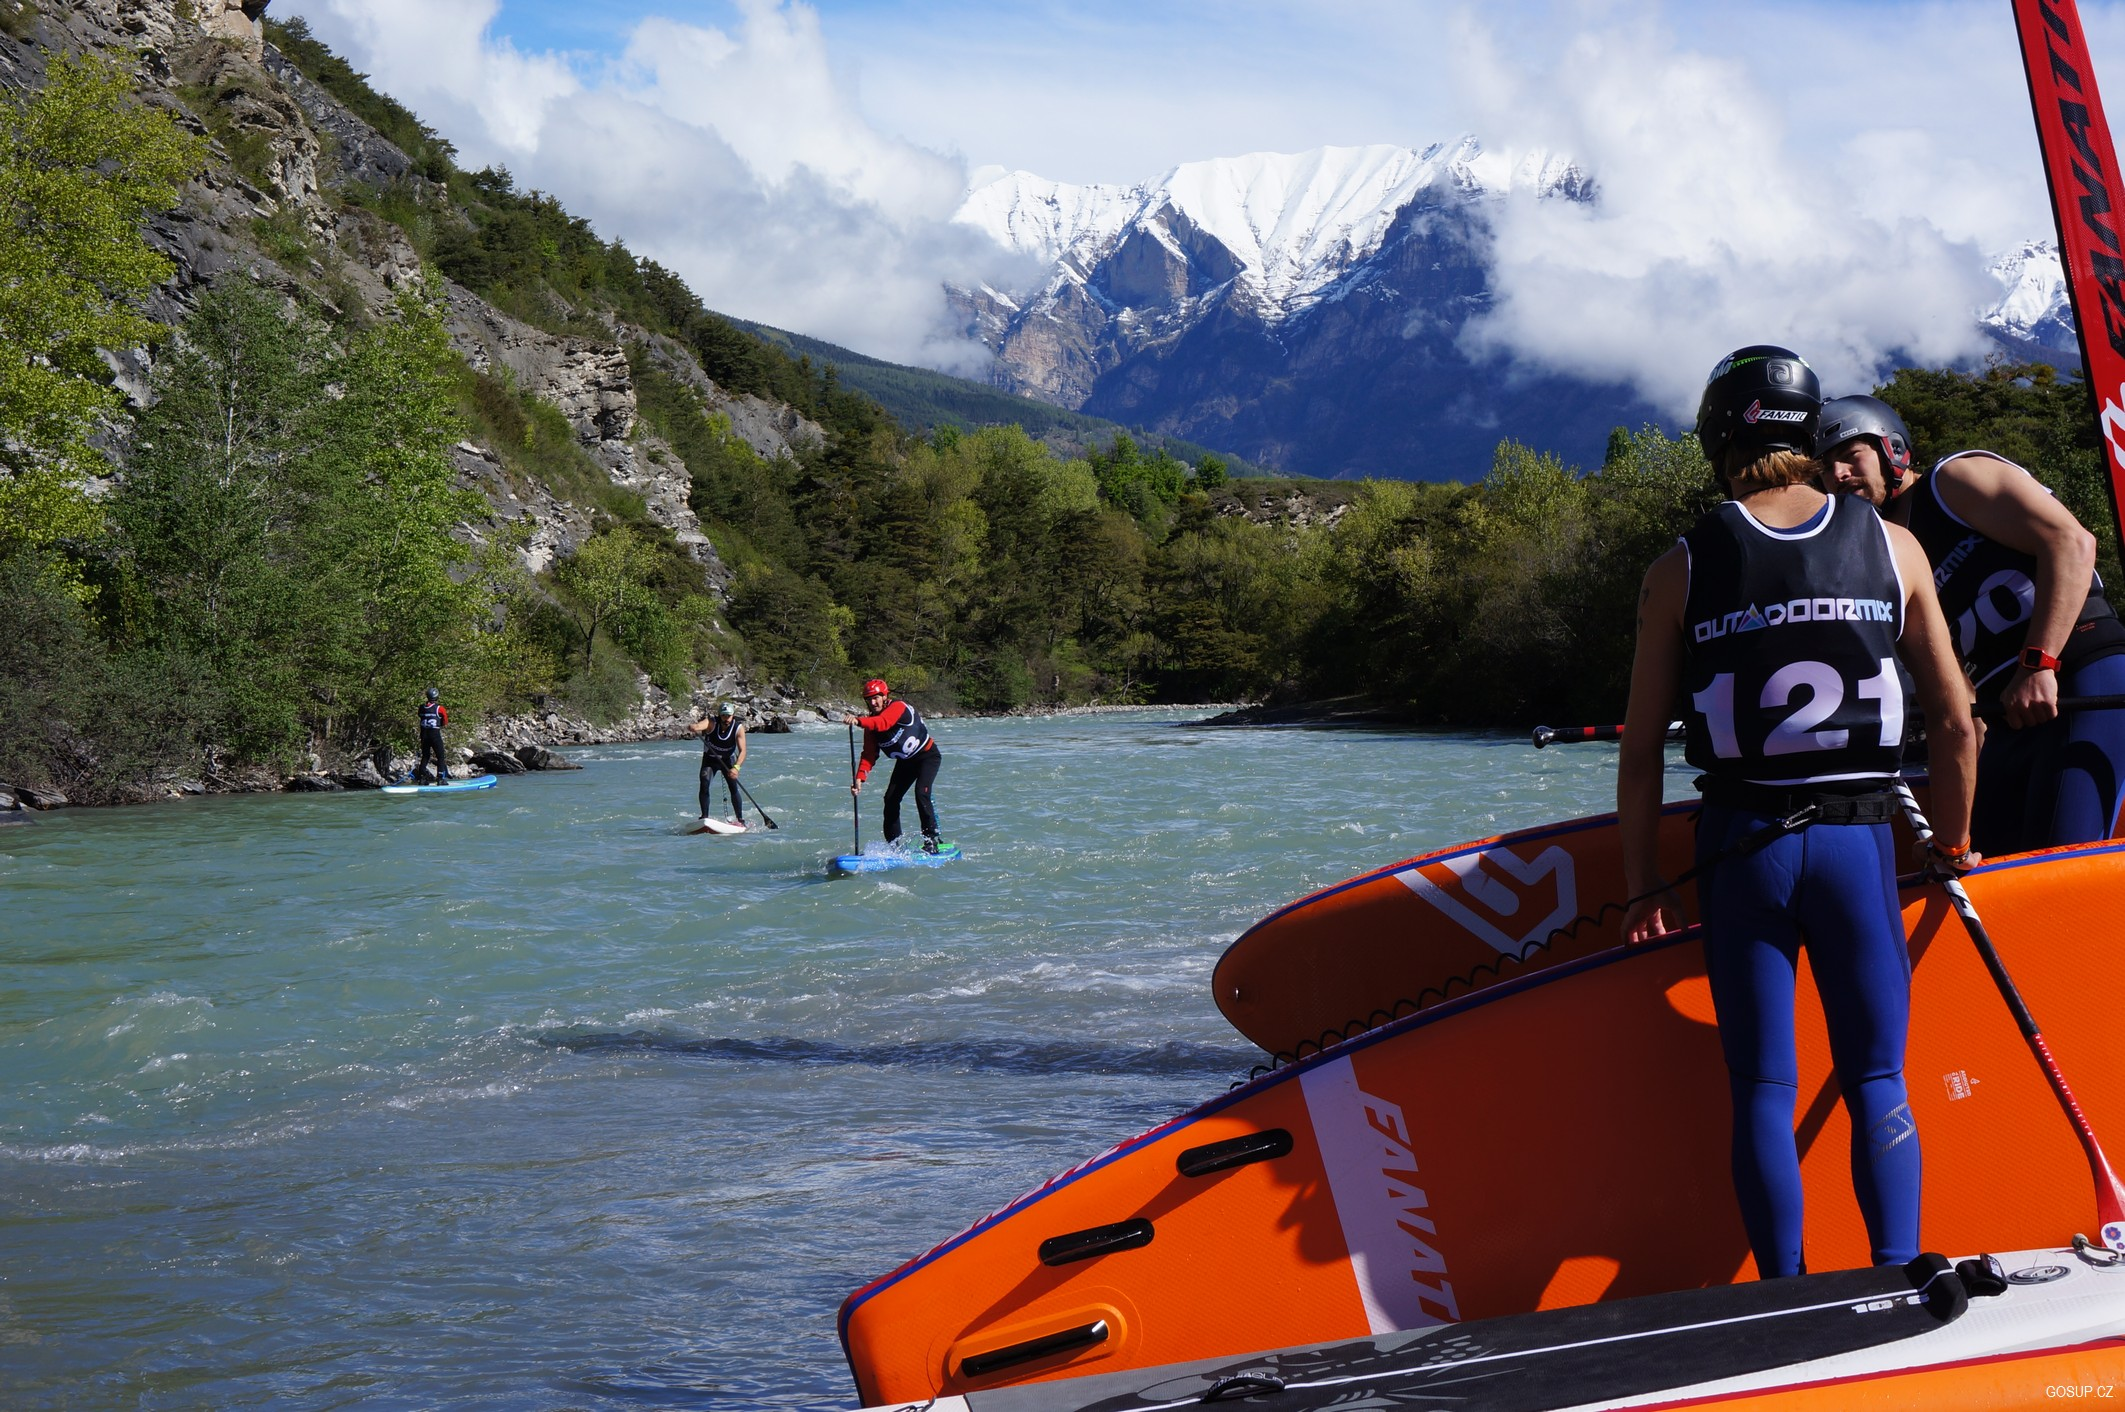 Francie: Řeka Durance